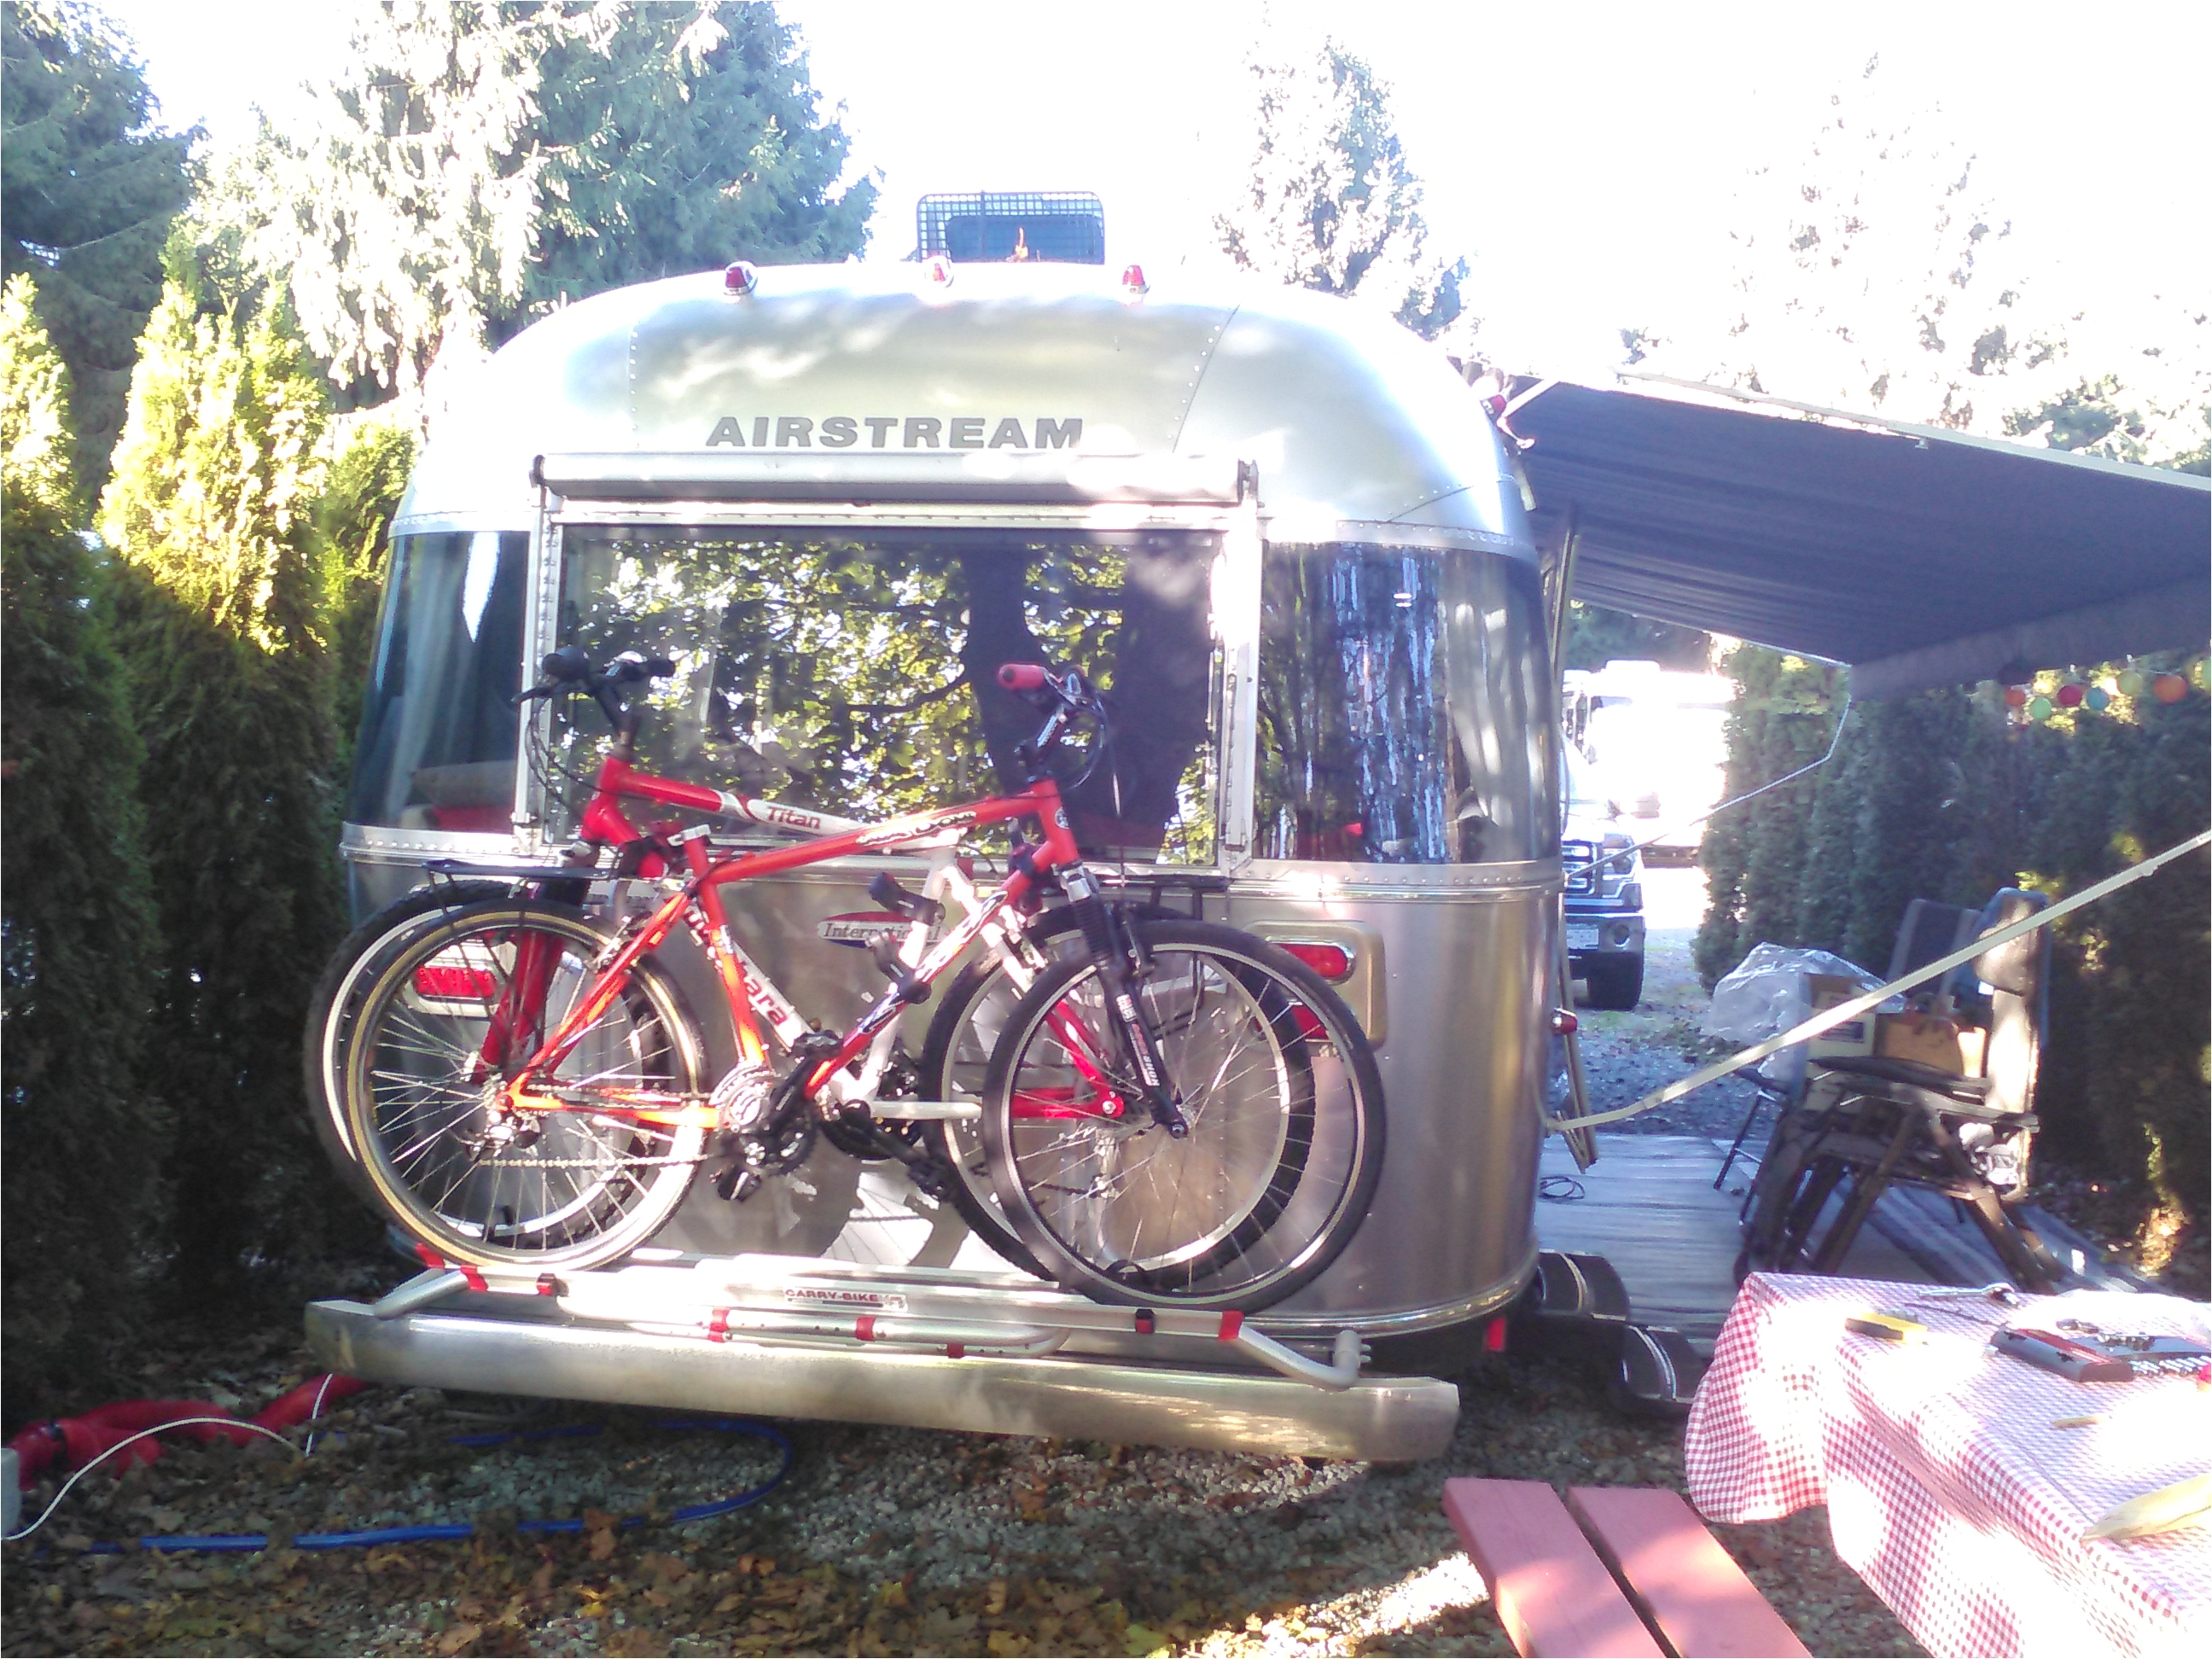 Fiamma Airstream Bike Rack today S Project Fiamma Bike Rack Tiny Shiny House On Wheels